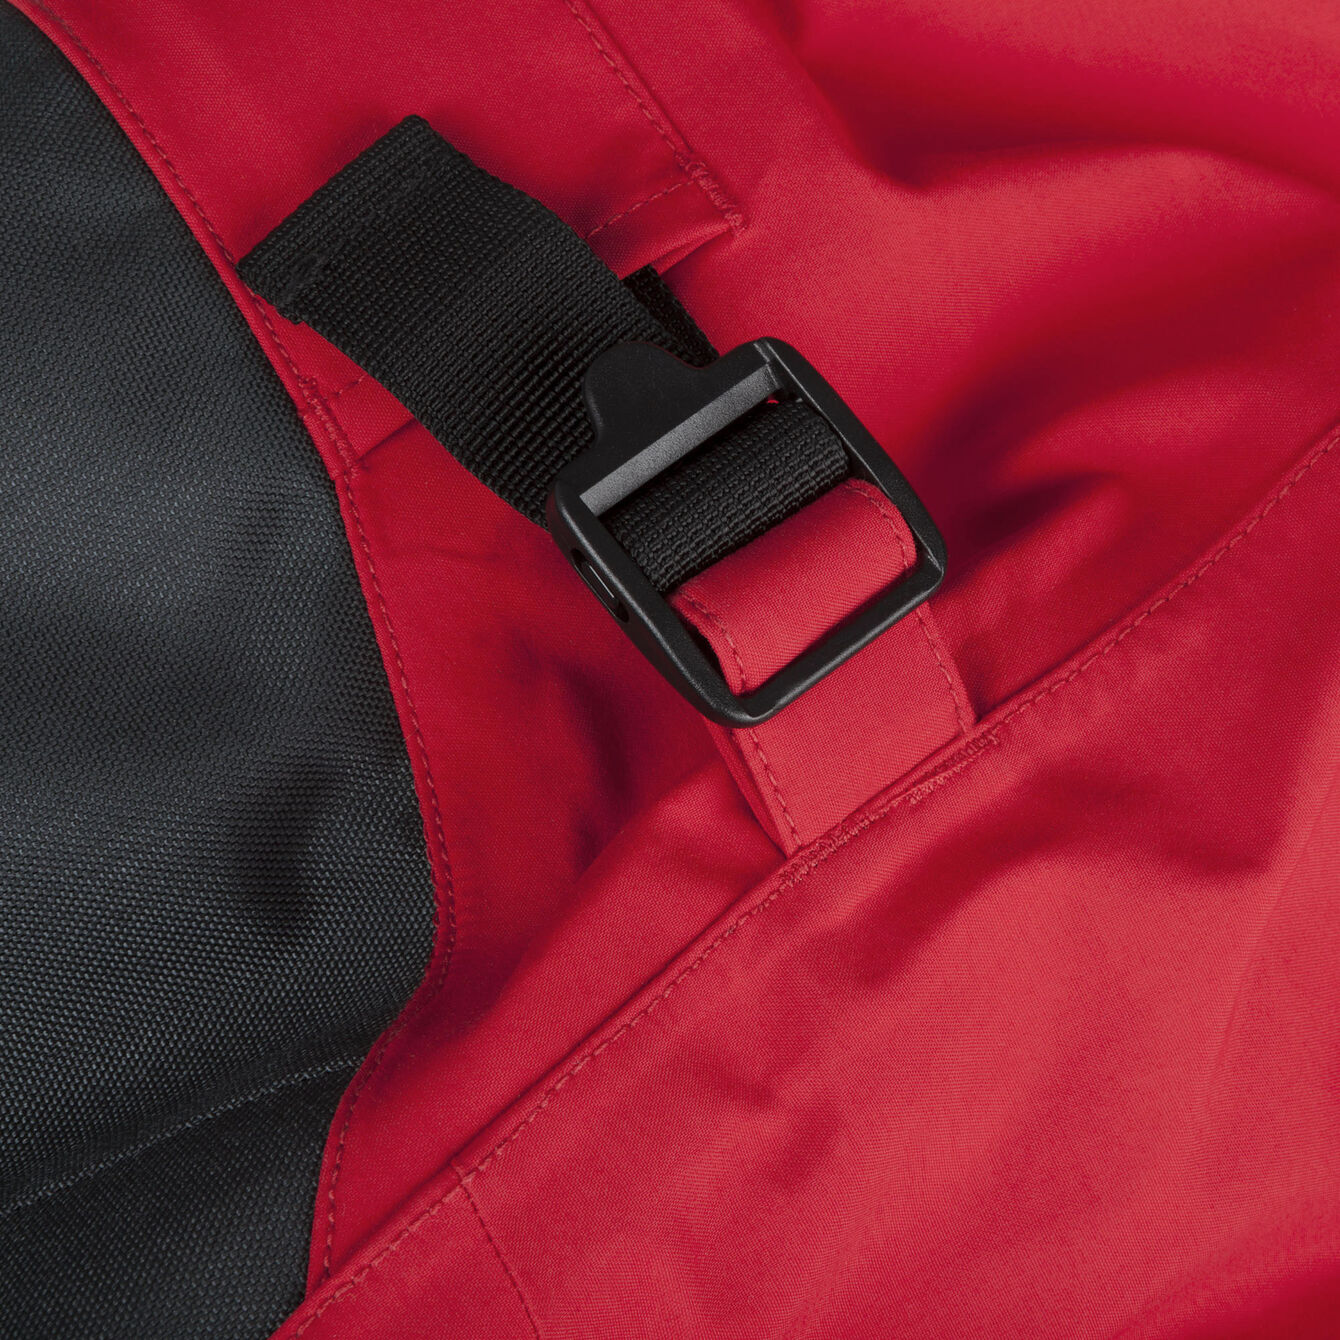 MPX Offshore bukse rød herre